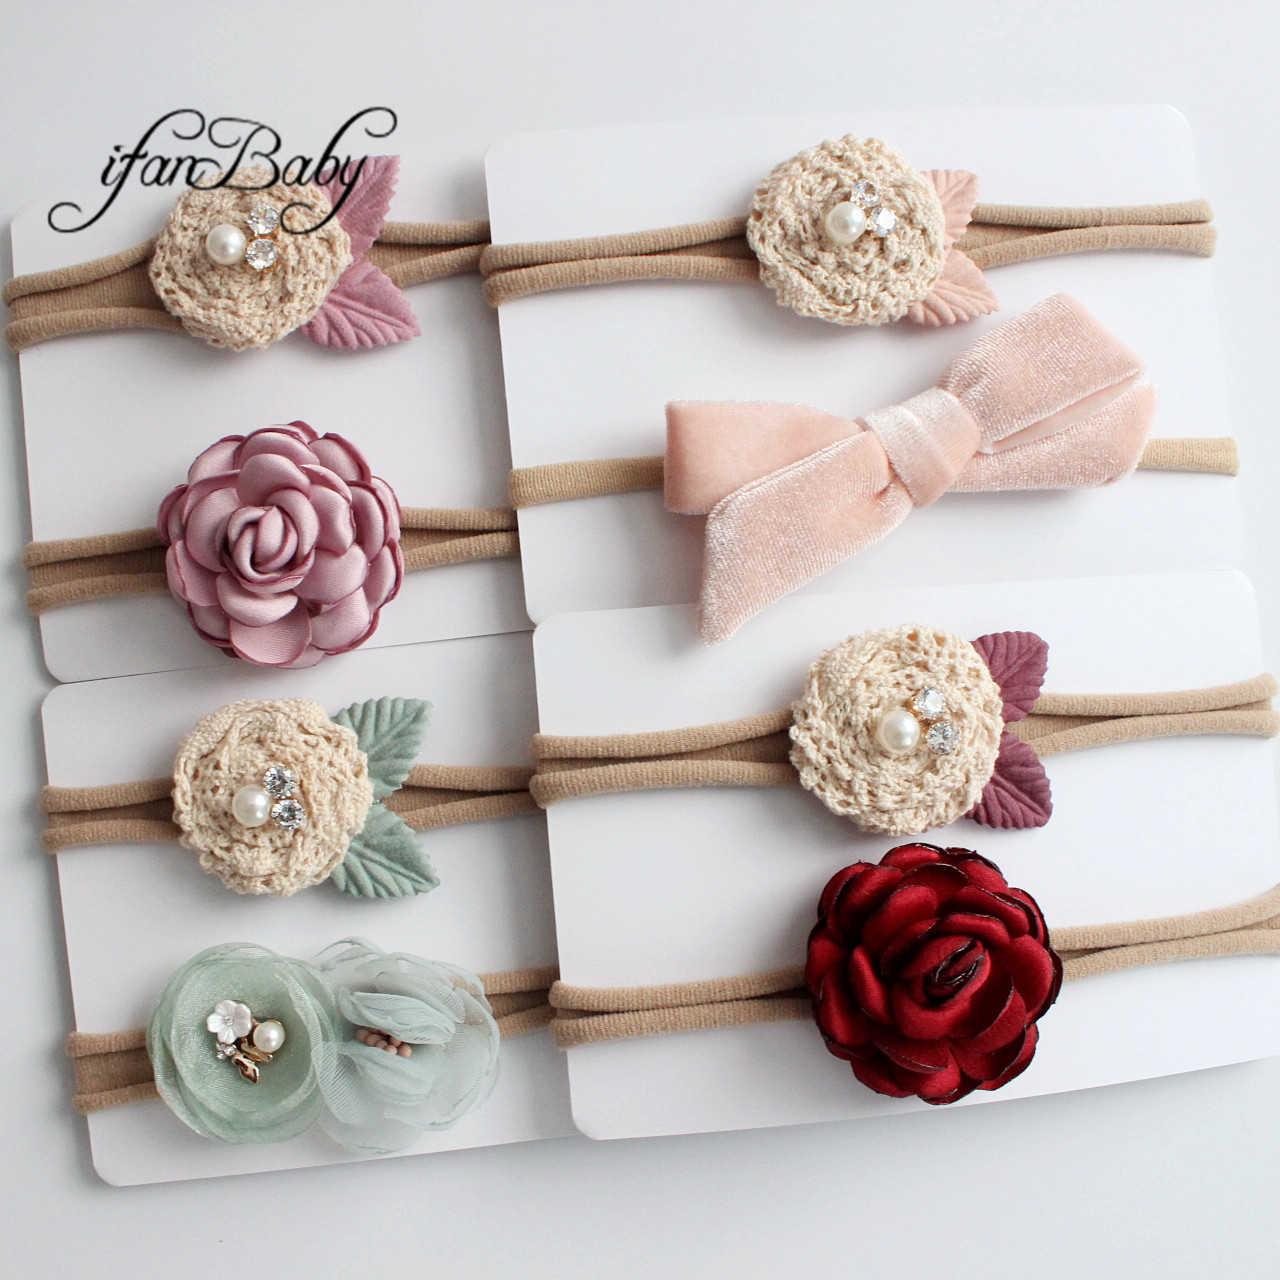 Linda diadema de flores niña niños diadema de nailon Flor de tela con diamantes de imitación lazo artículo para la cabeza